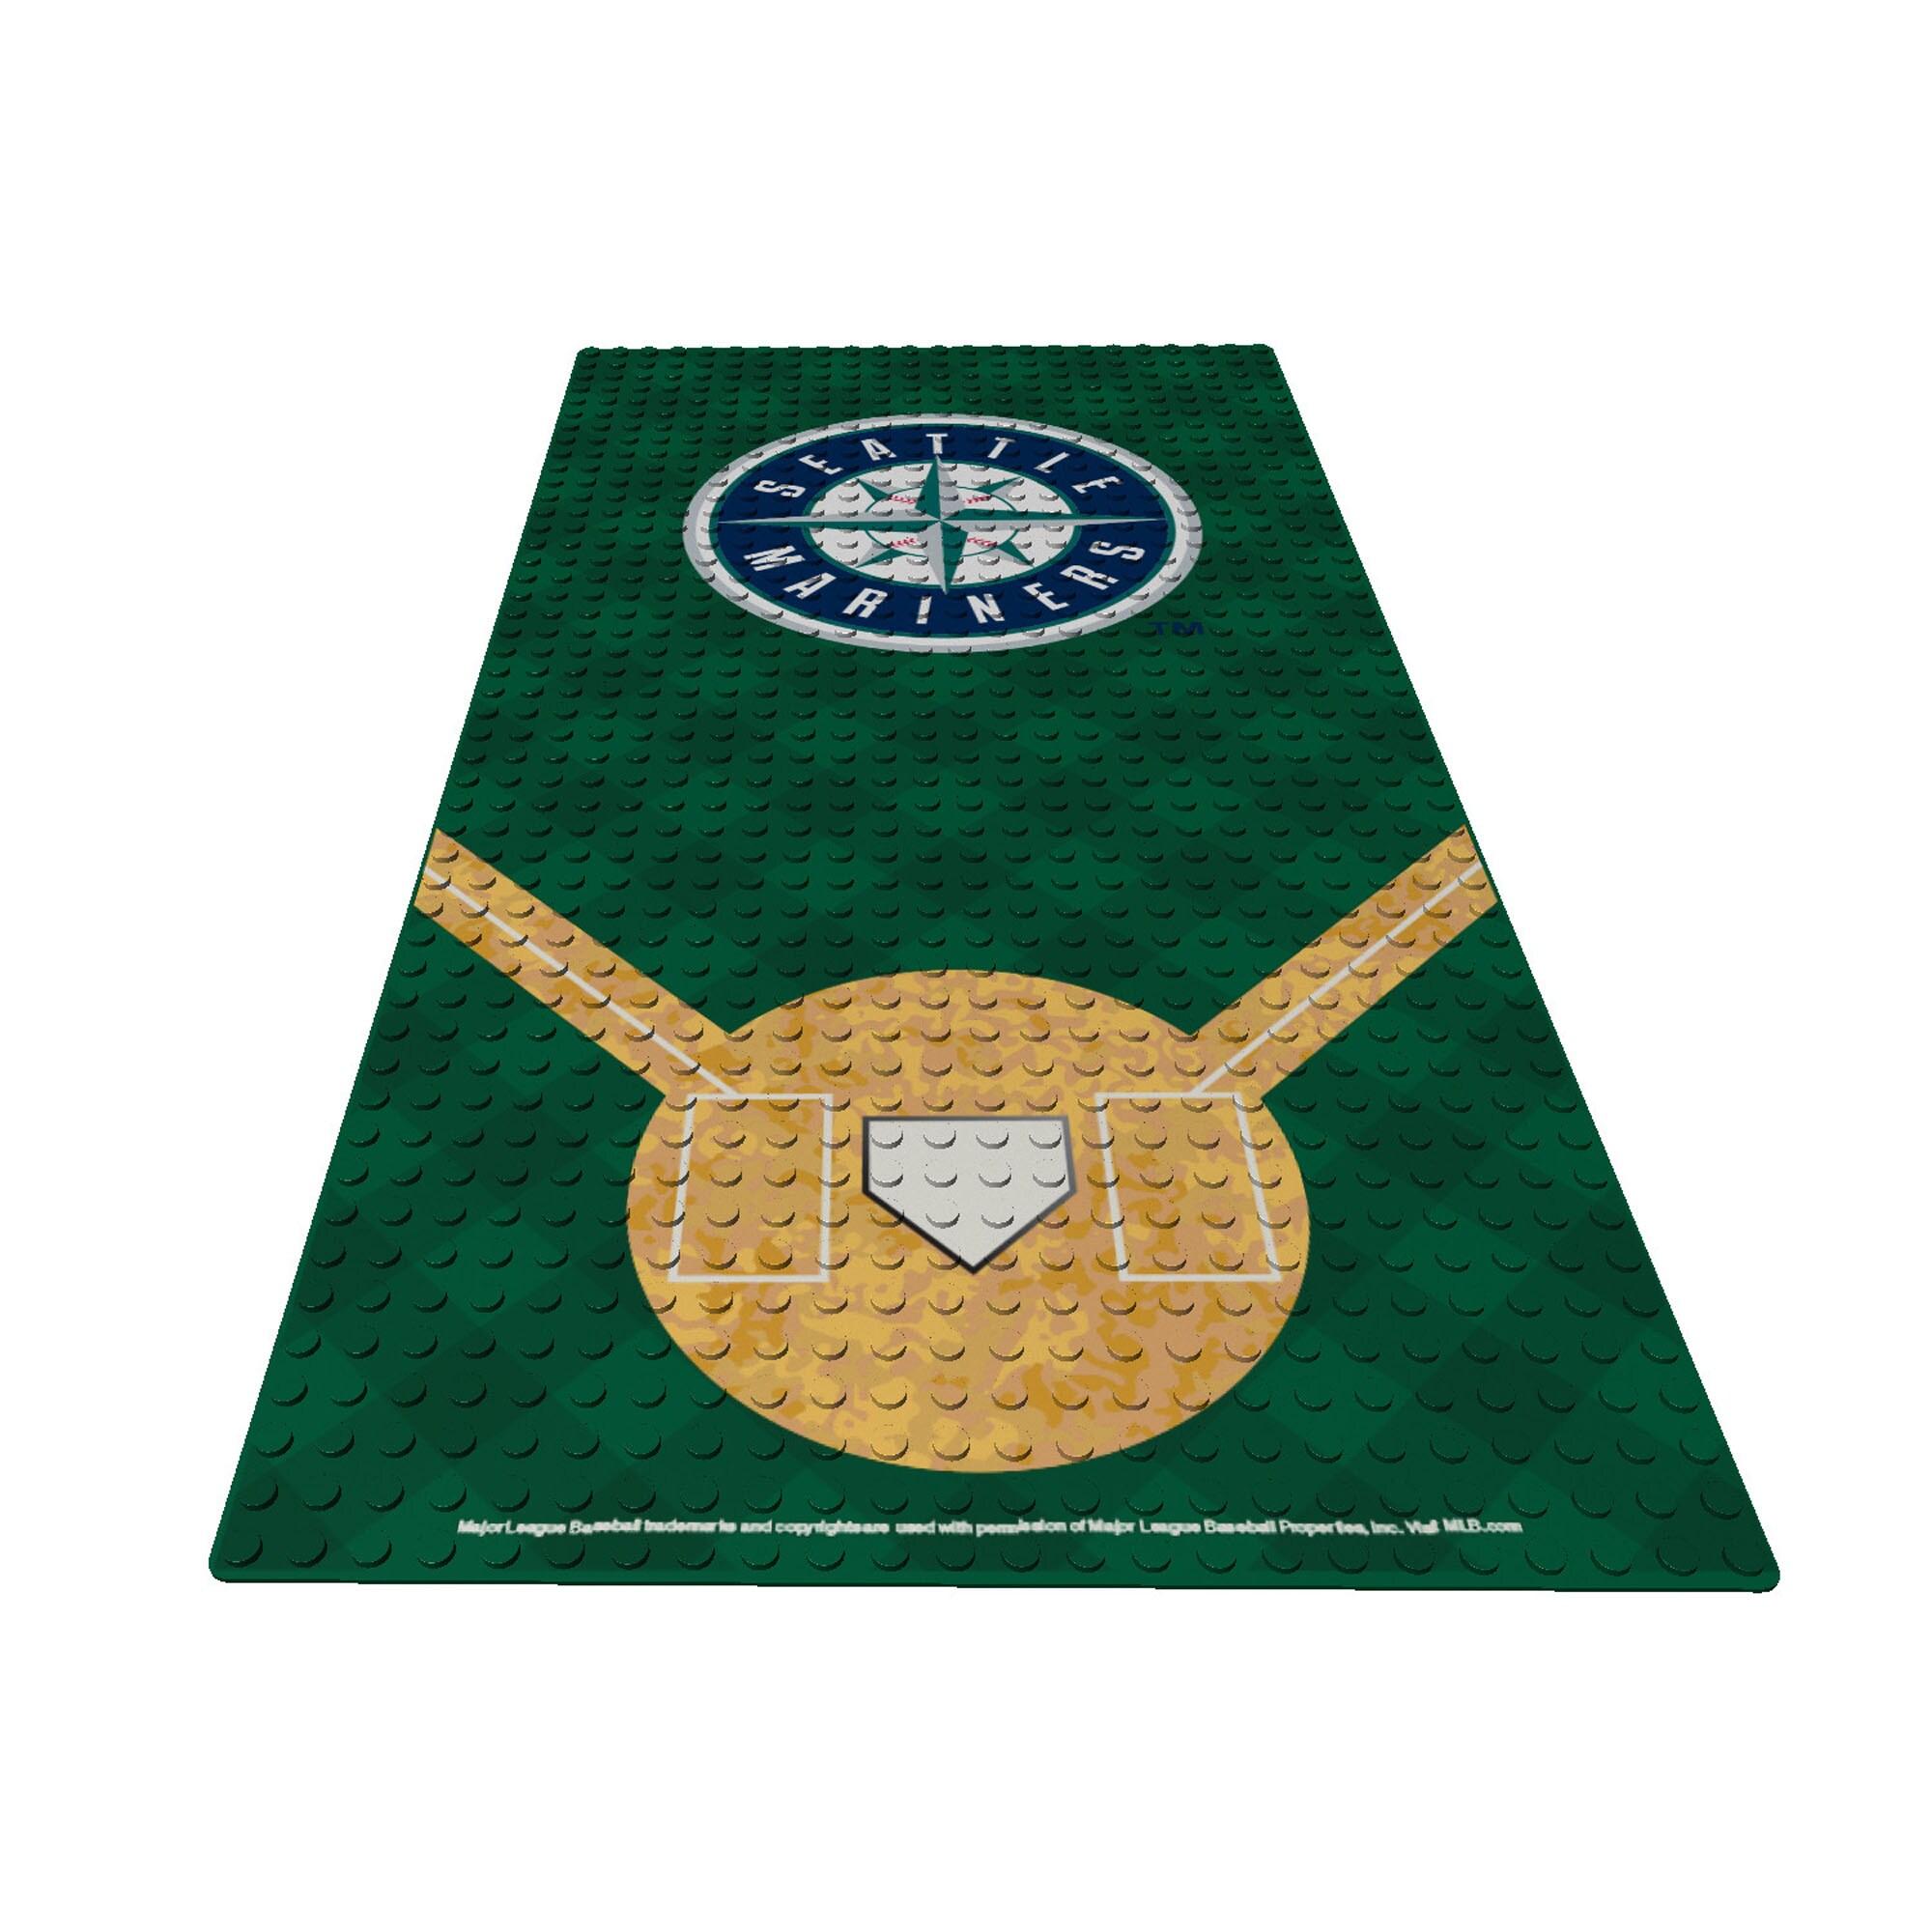 Seattle Mariners OYO Sports Display Plate